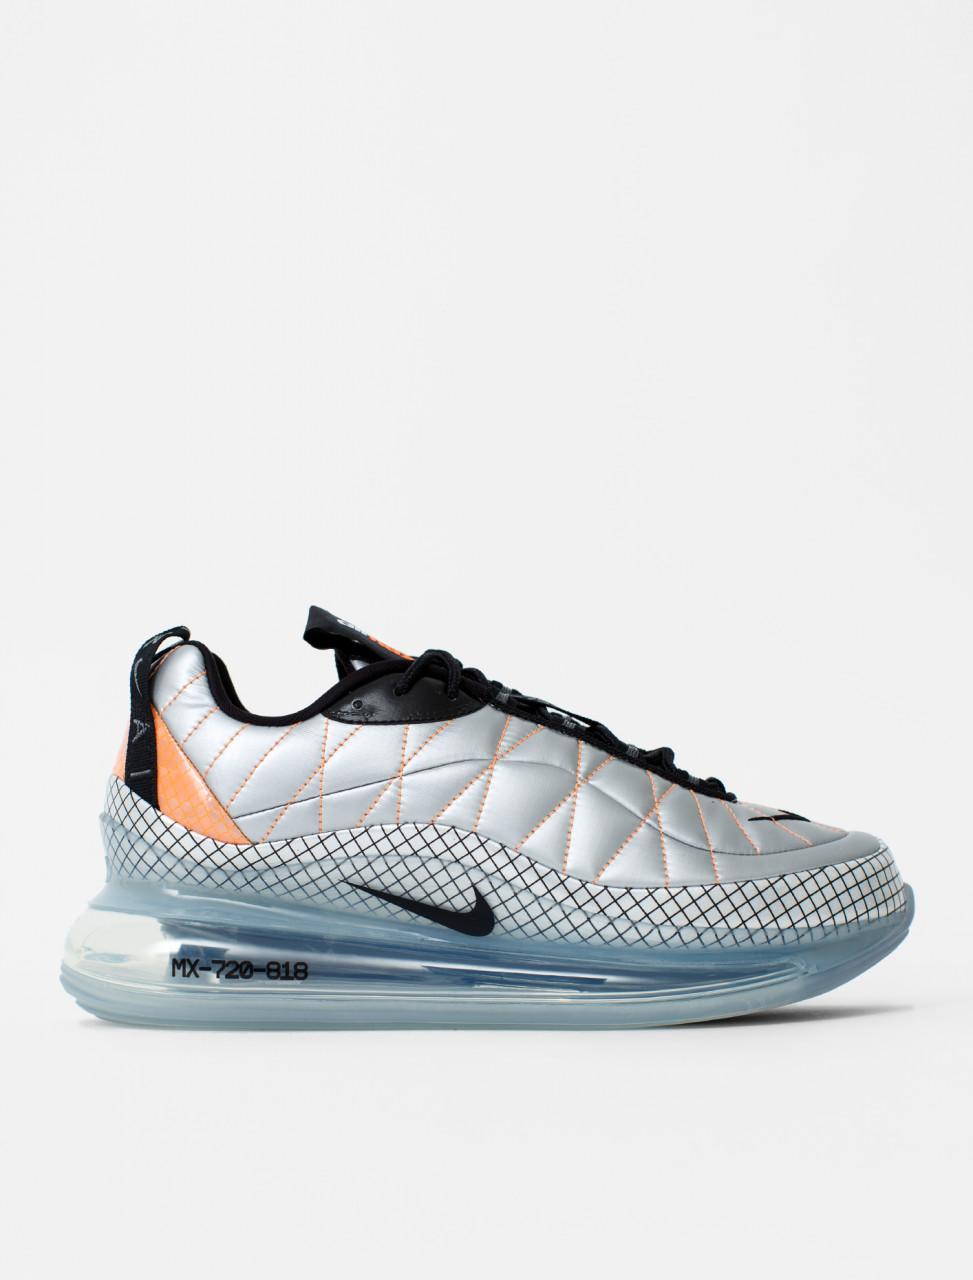 WMNS MX-720-818 Sneaker